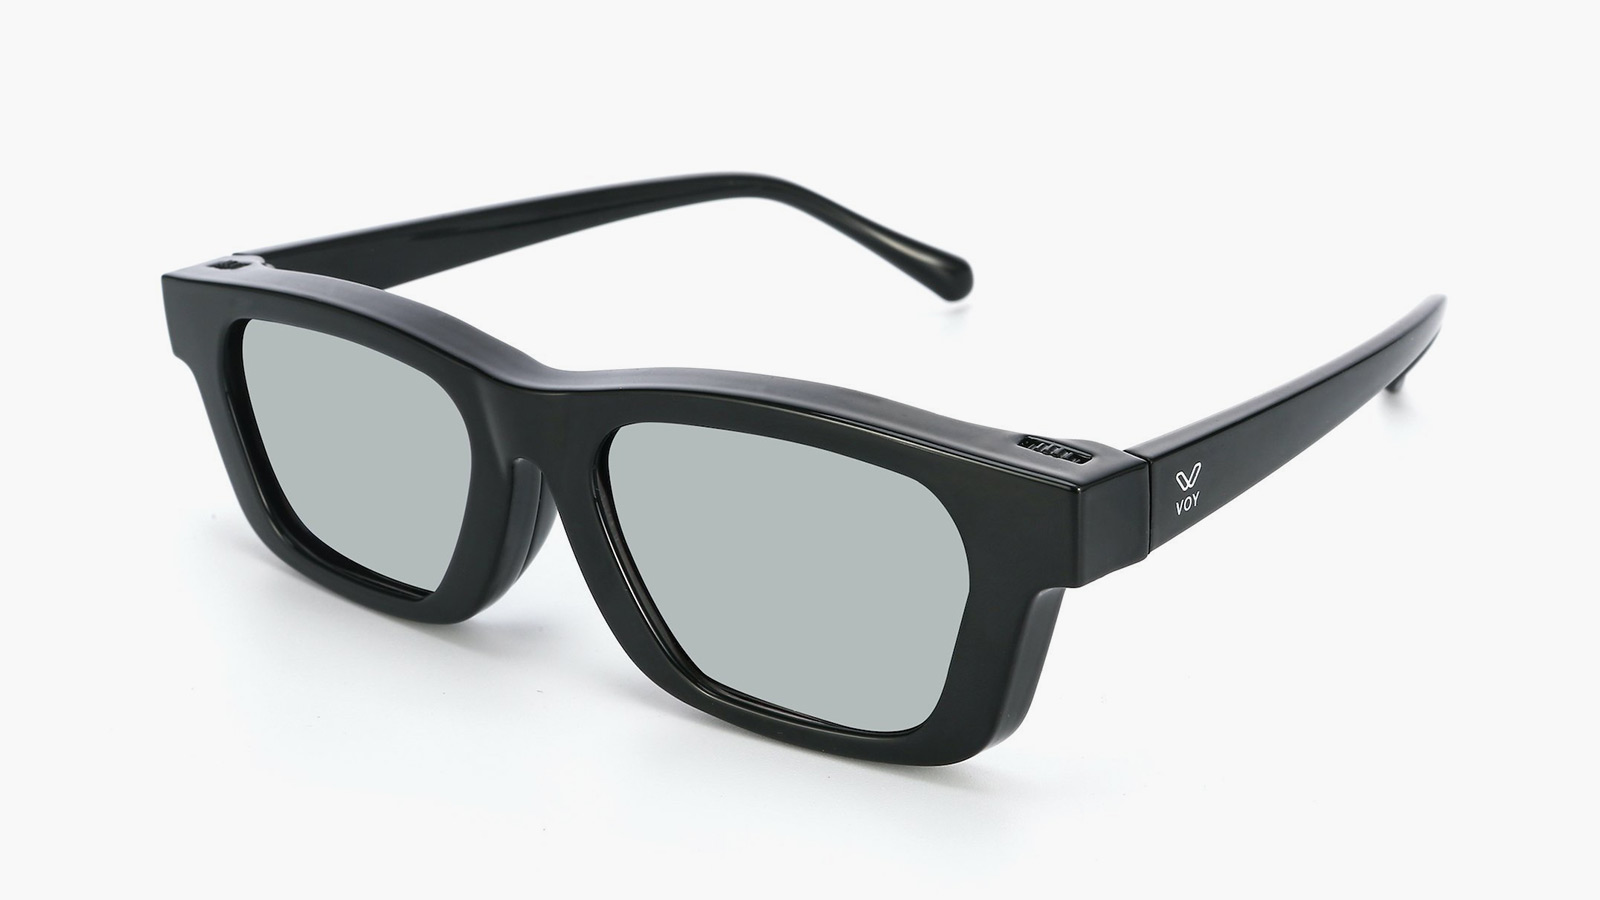 Voy Tunable Eyeglasses